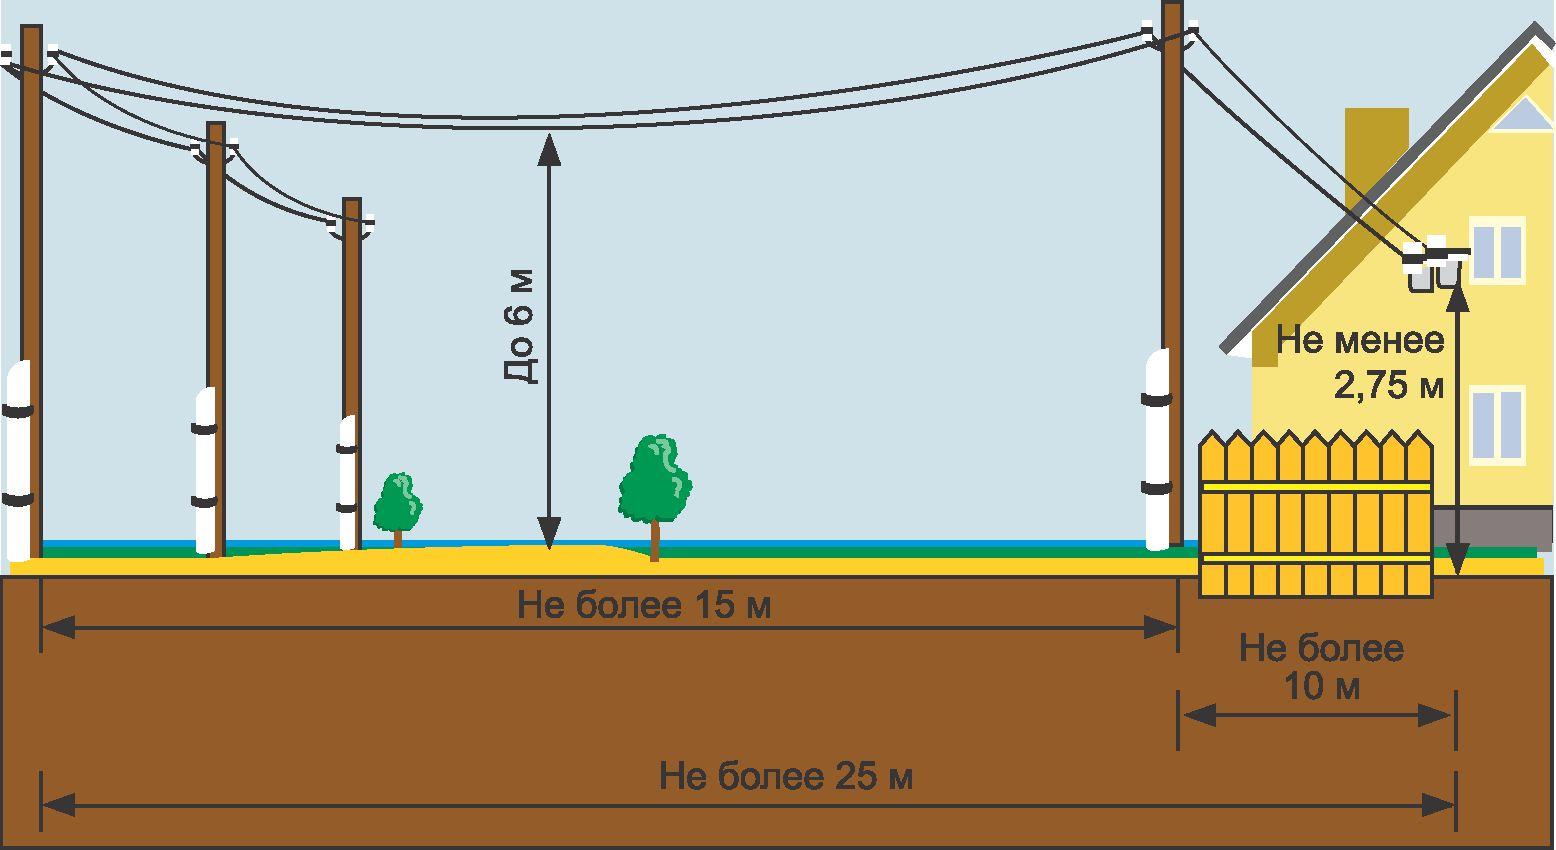 Схема лэп подключение в районе